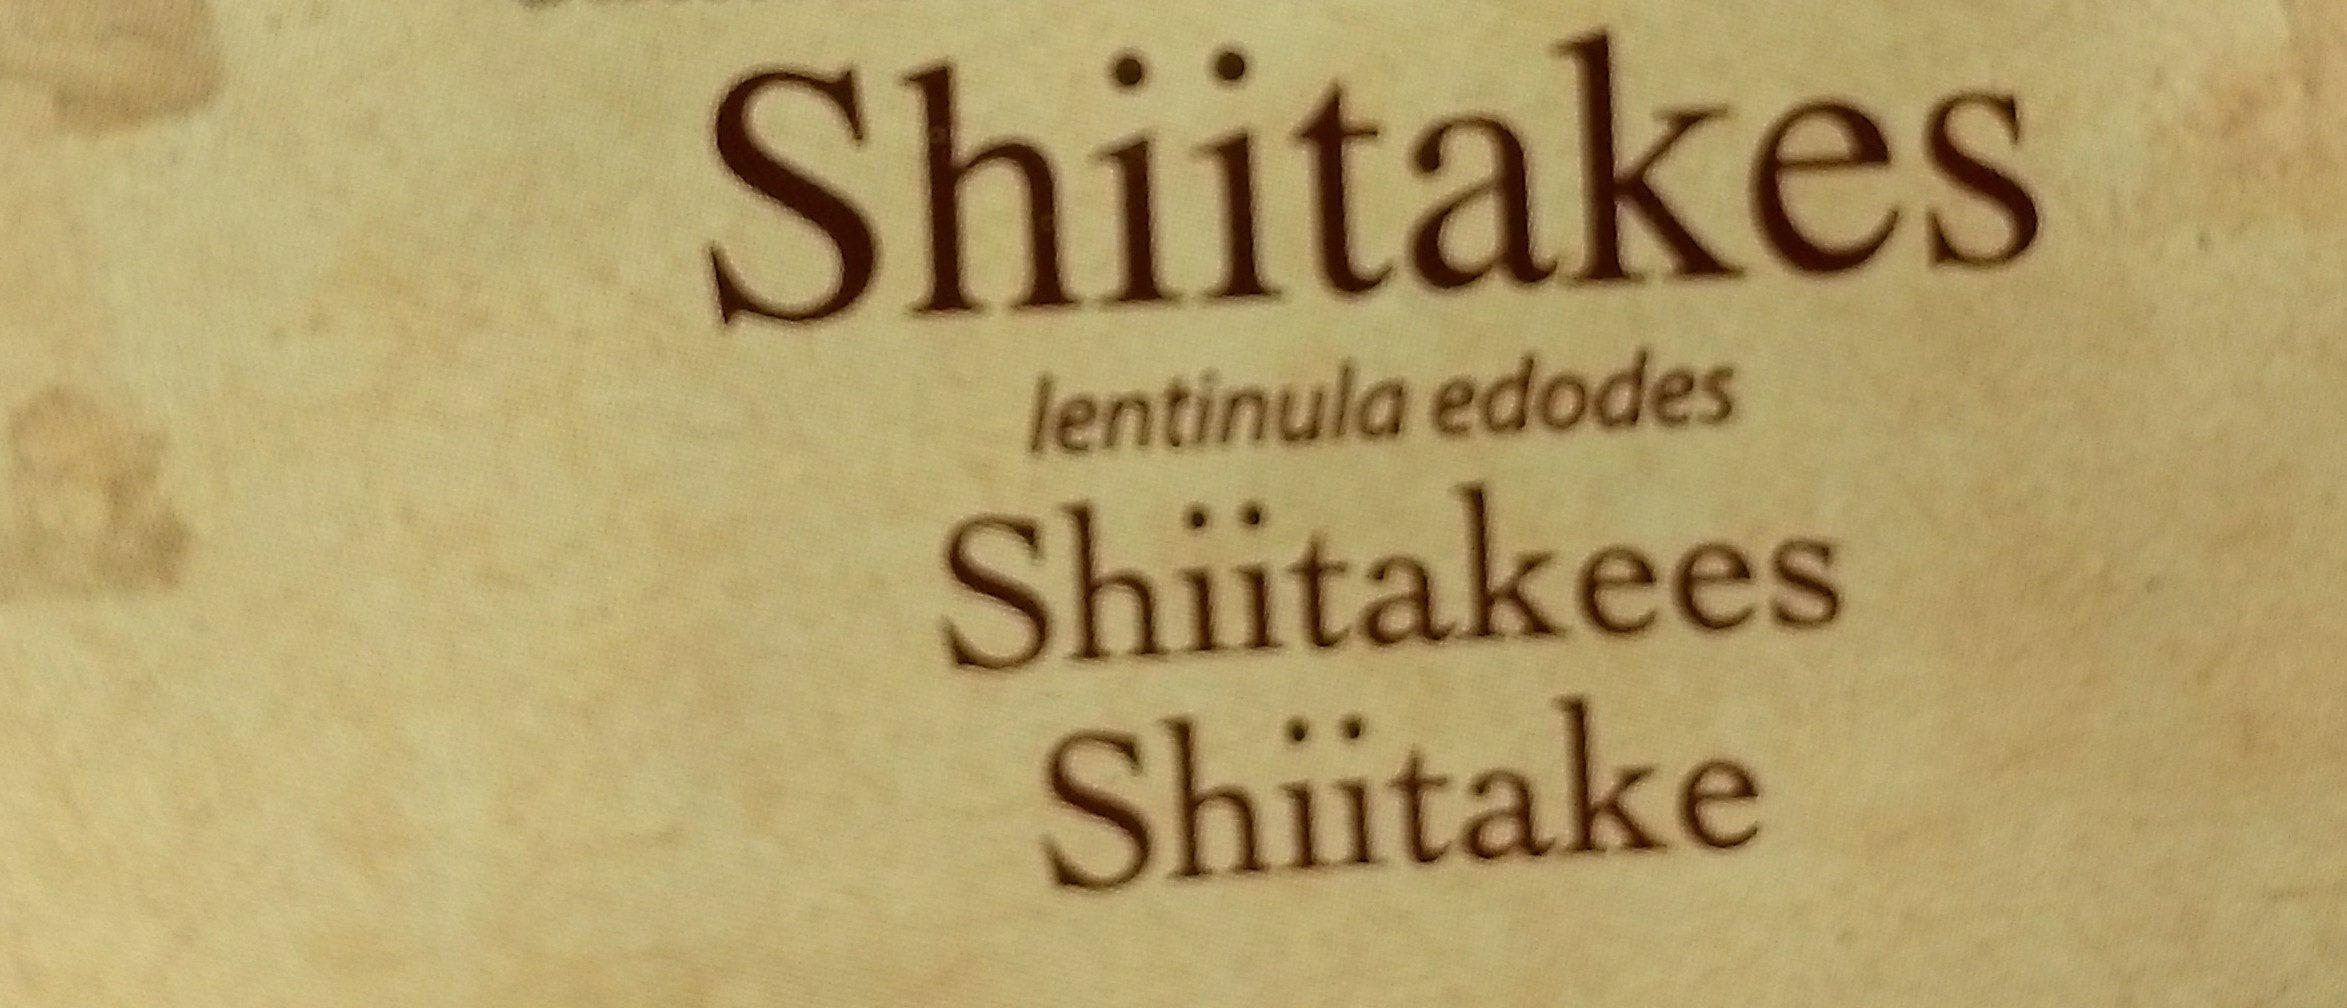 Shiitakes Entiers Sachet - Ingrédients